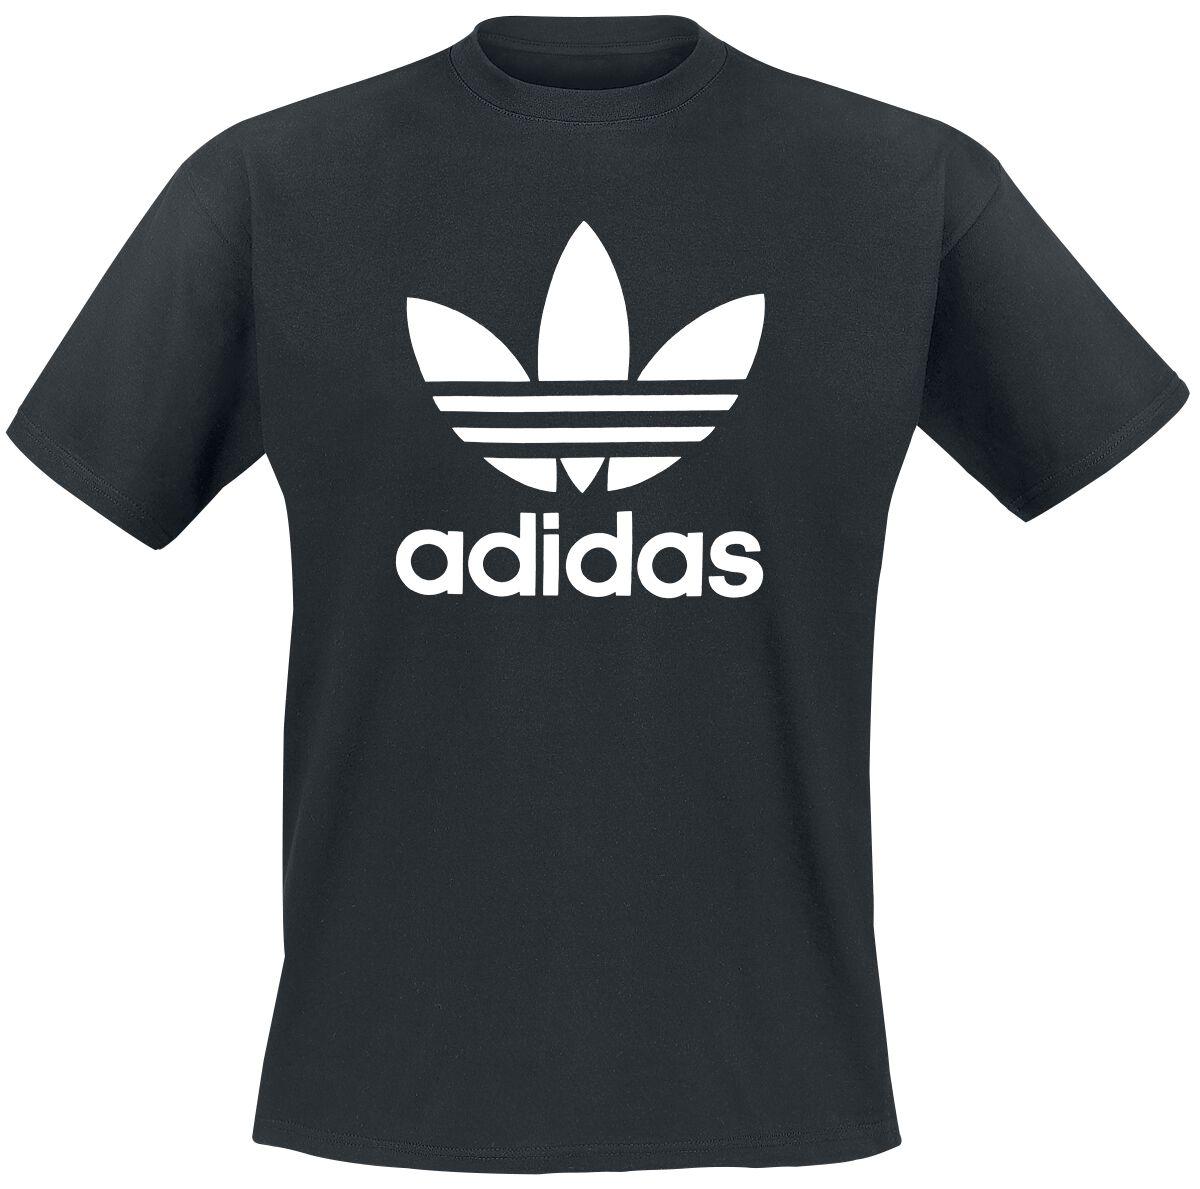 Image of   Adidas Trefoil T-Shirt T-Shirt sort-hvid